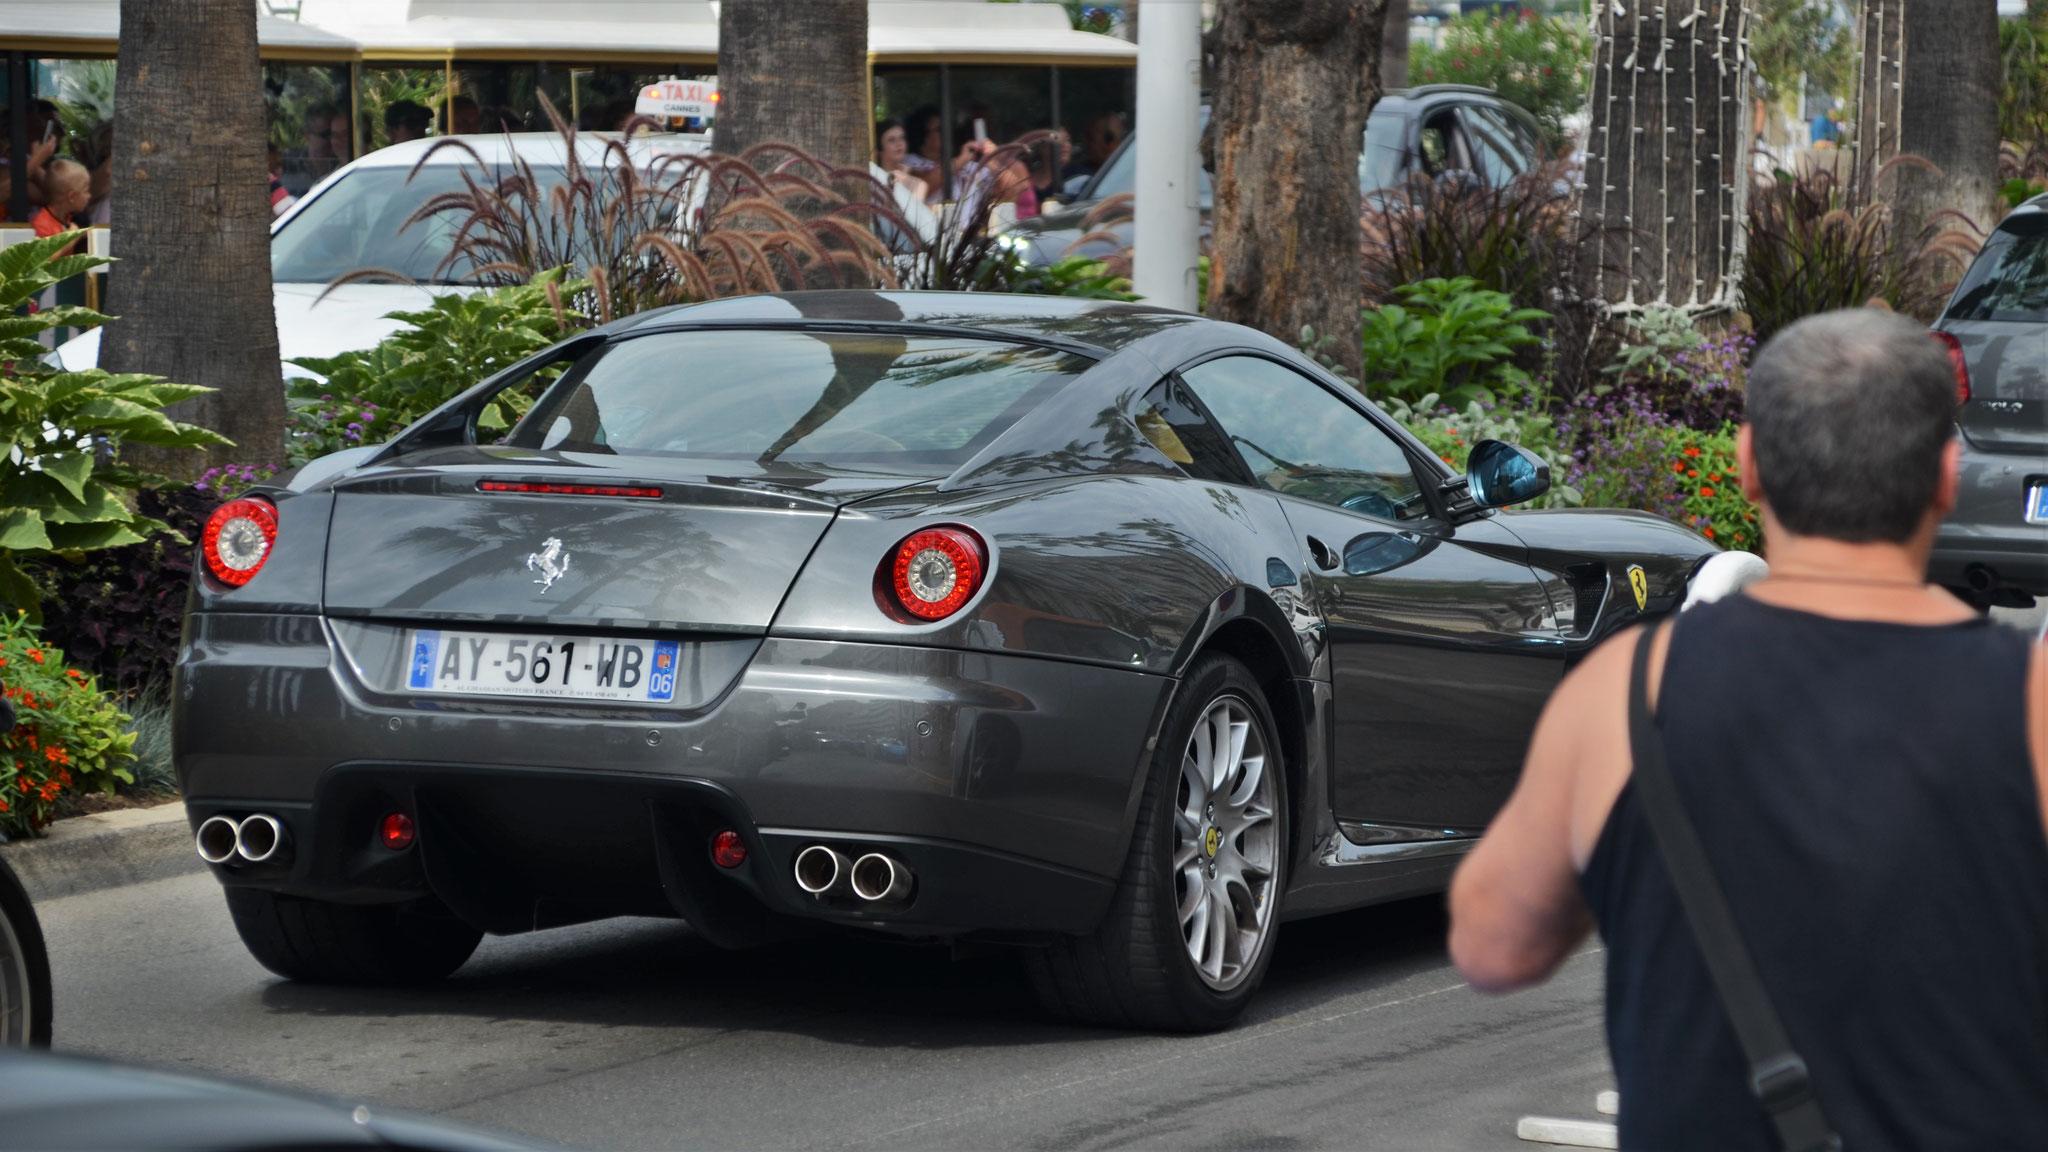 Ferrari 599 GTB - AY-561-WB-06 (FRA)